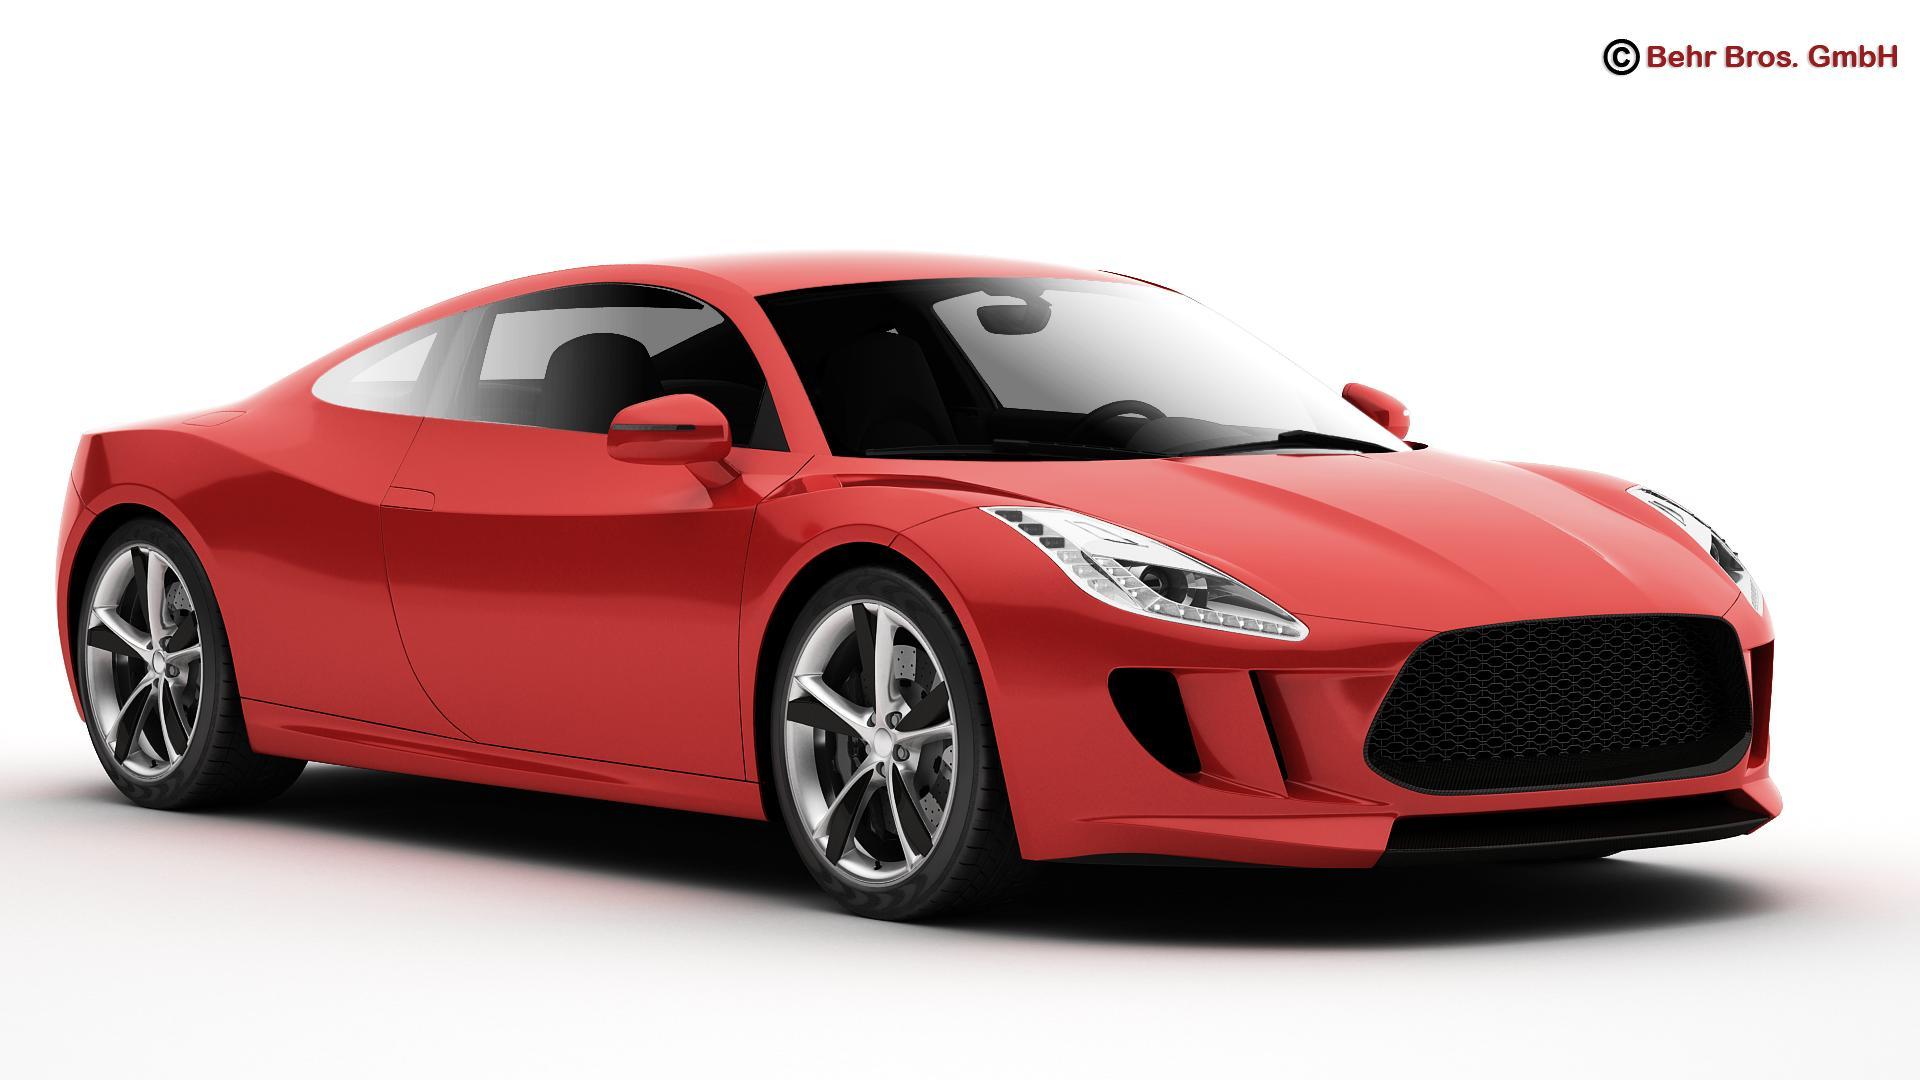 generic sports car 3d model 3ds max fbx c4d lwo ma mb obj 160517